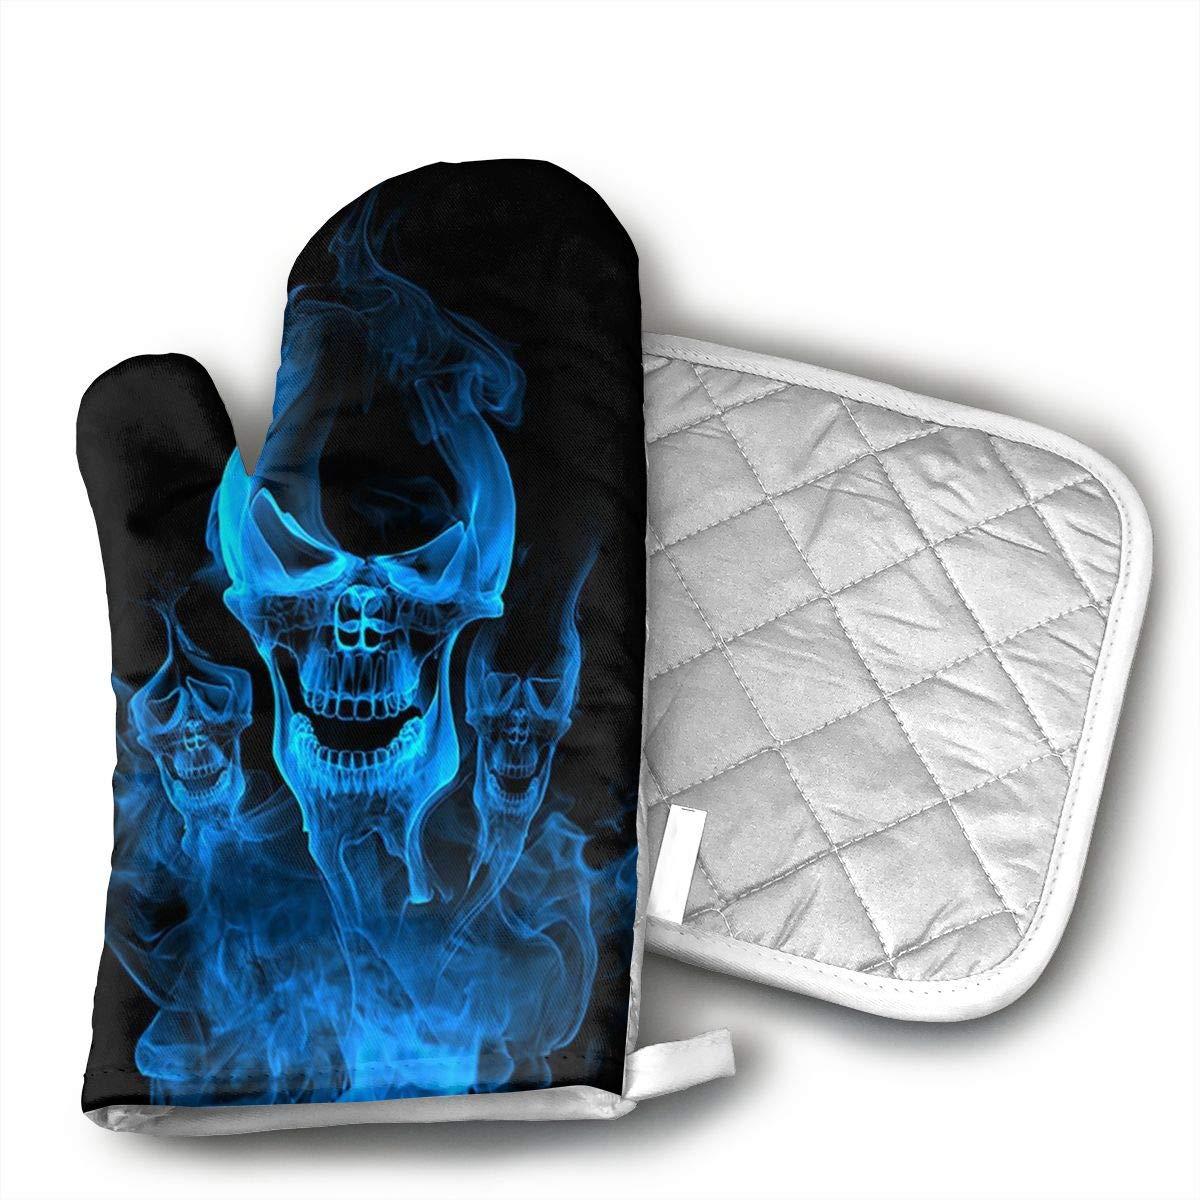 LOEBGF Blue Burnning Flame Skeleton Skull Head Oven Gloves Kitchen Gloves and Pot Holder 2 Pieces for Cooking, Baking, Barbecue